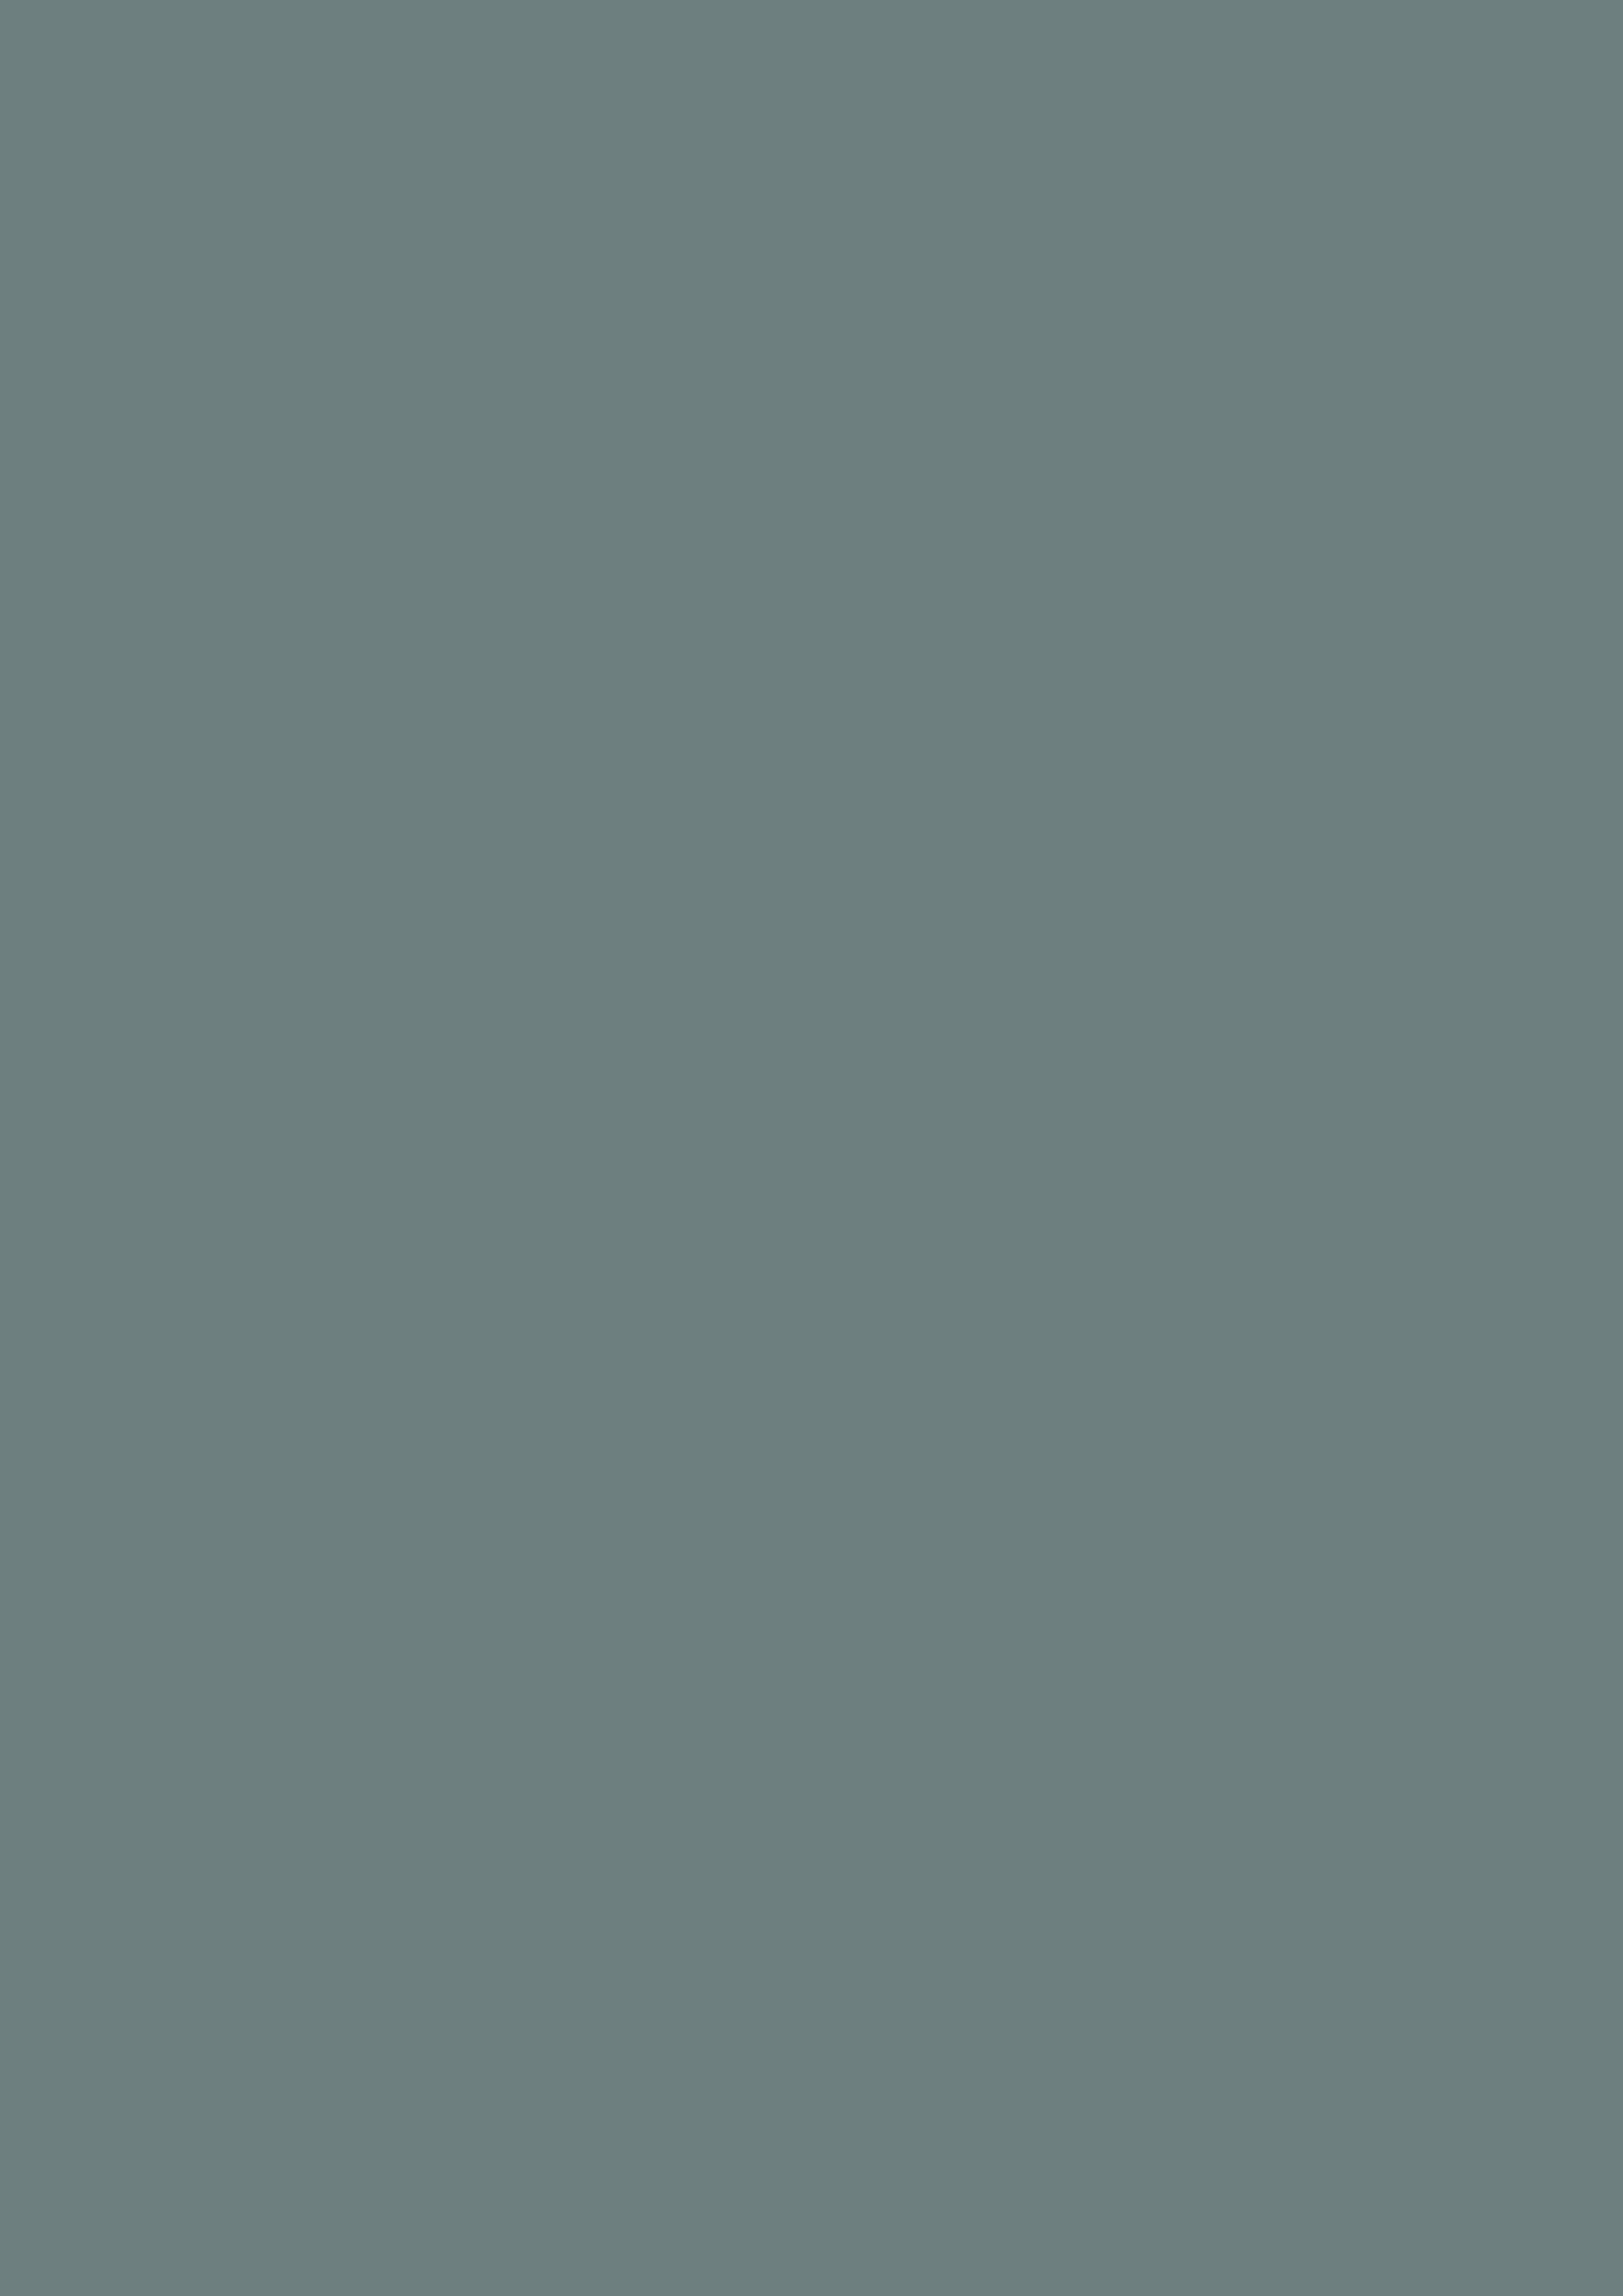 2480x3508 AuroMetalSaurus Solid Color Background